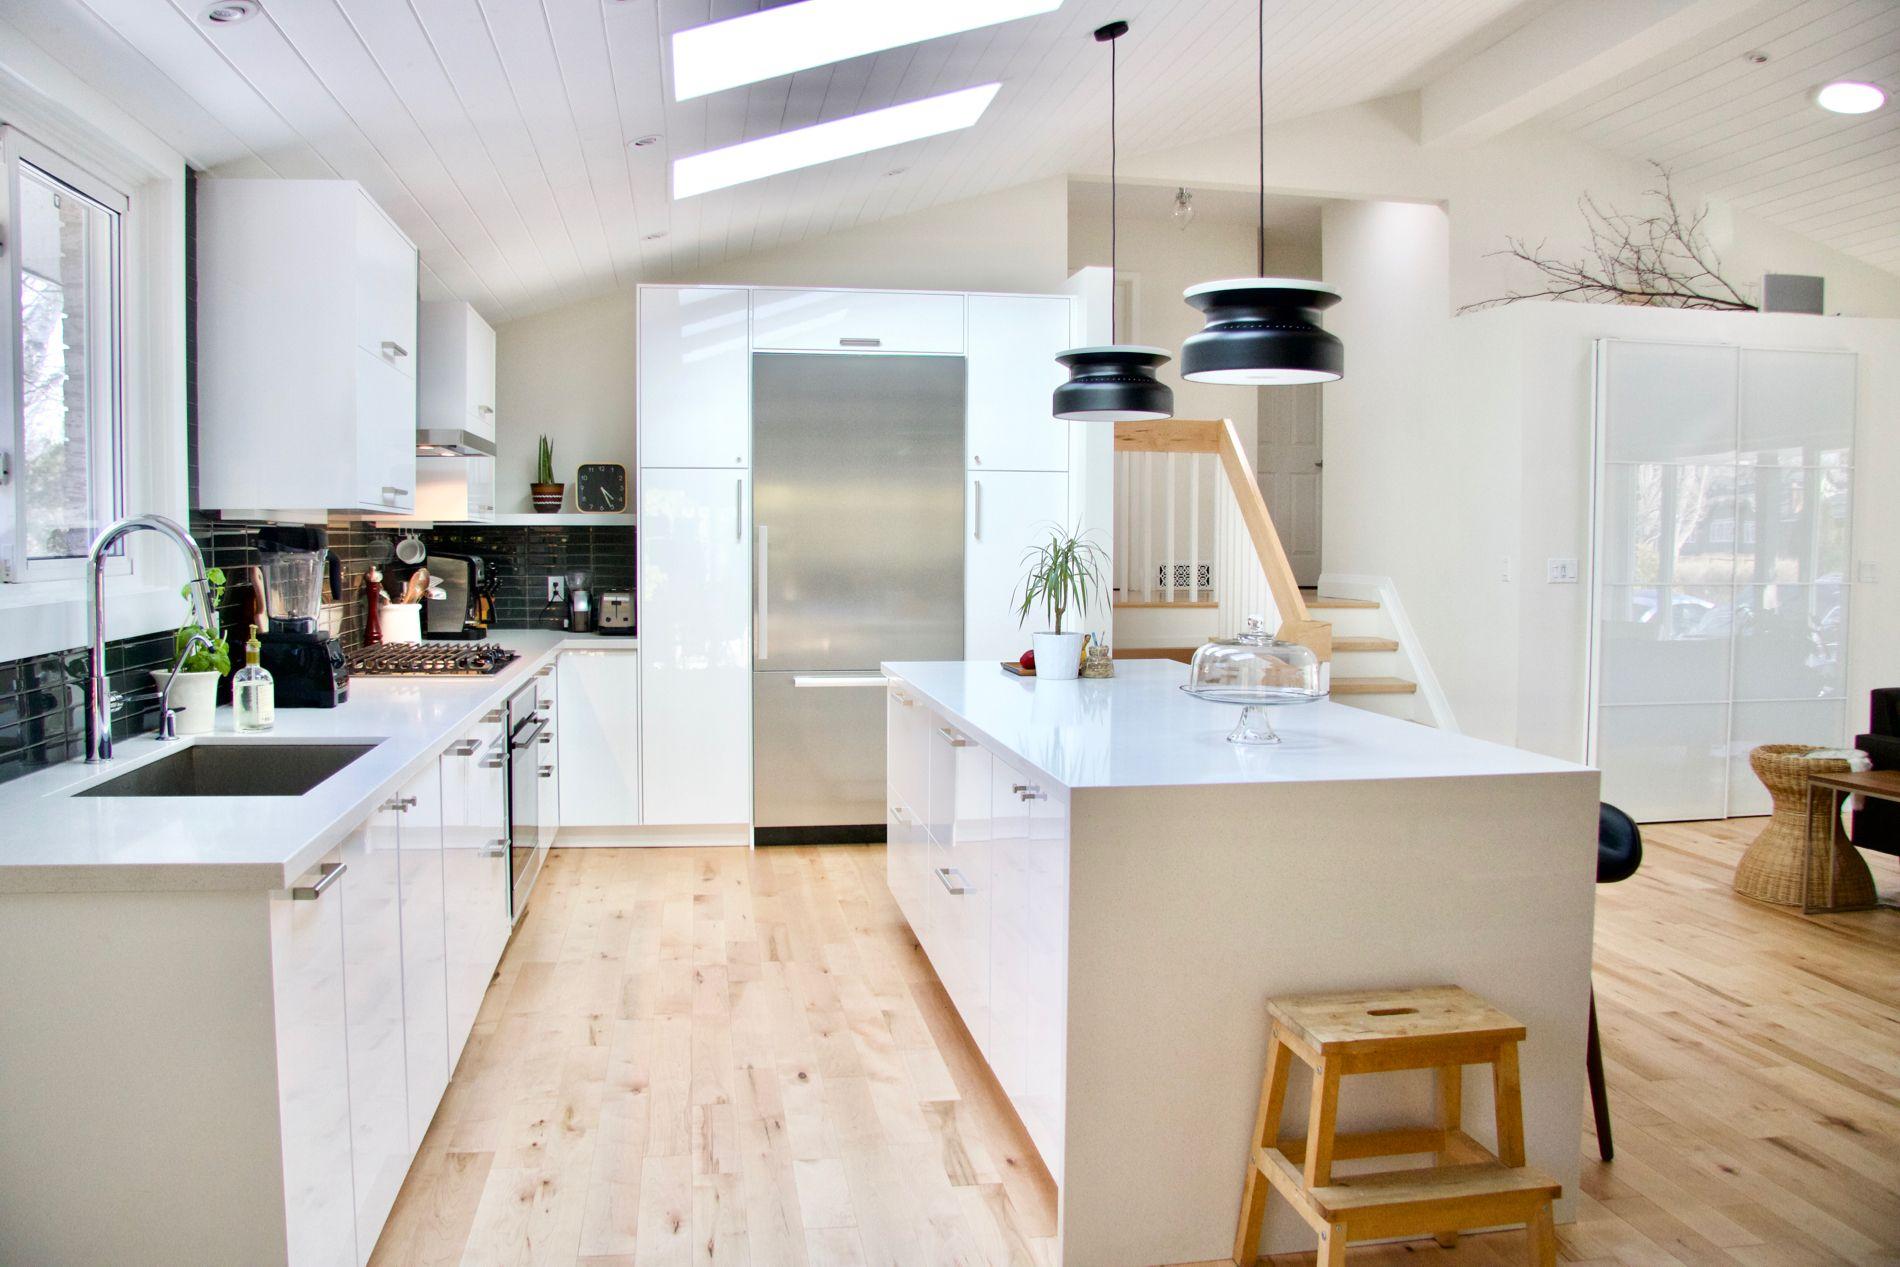 Ikea kitchen   midcentury modern kitchen   white kitchen   vaulted ...